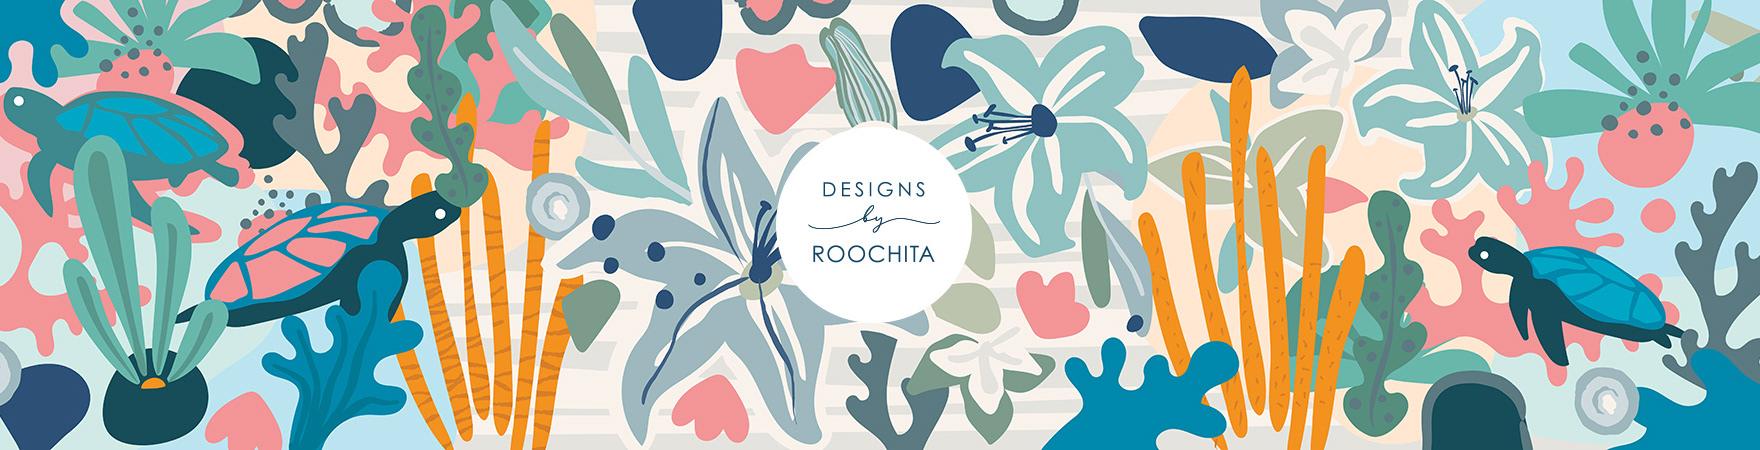 Designs by Roochita